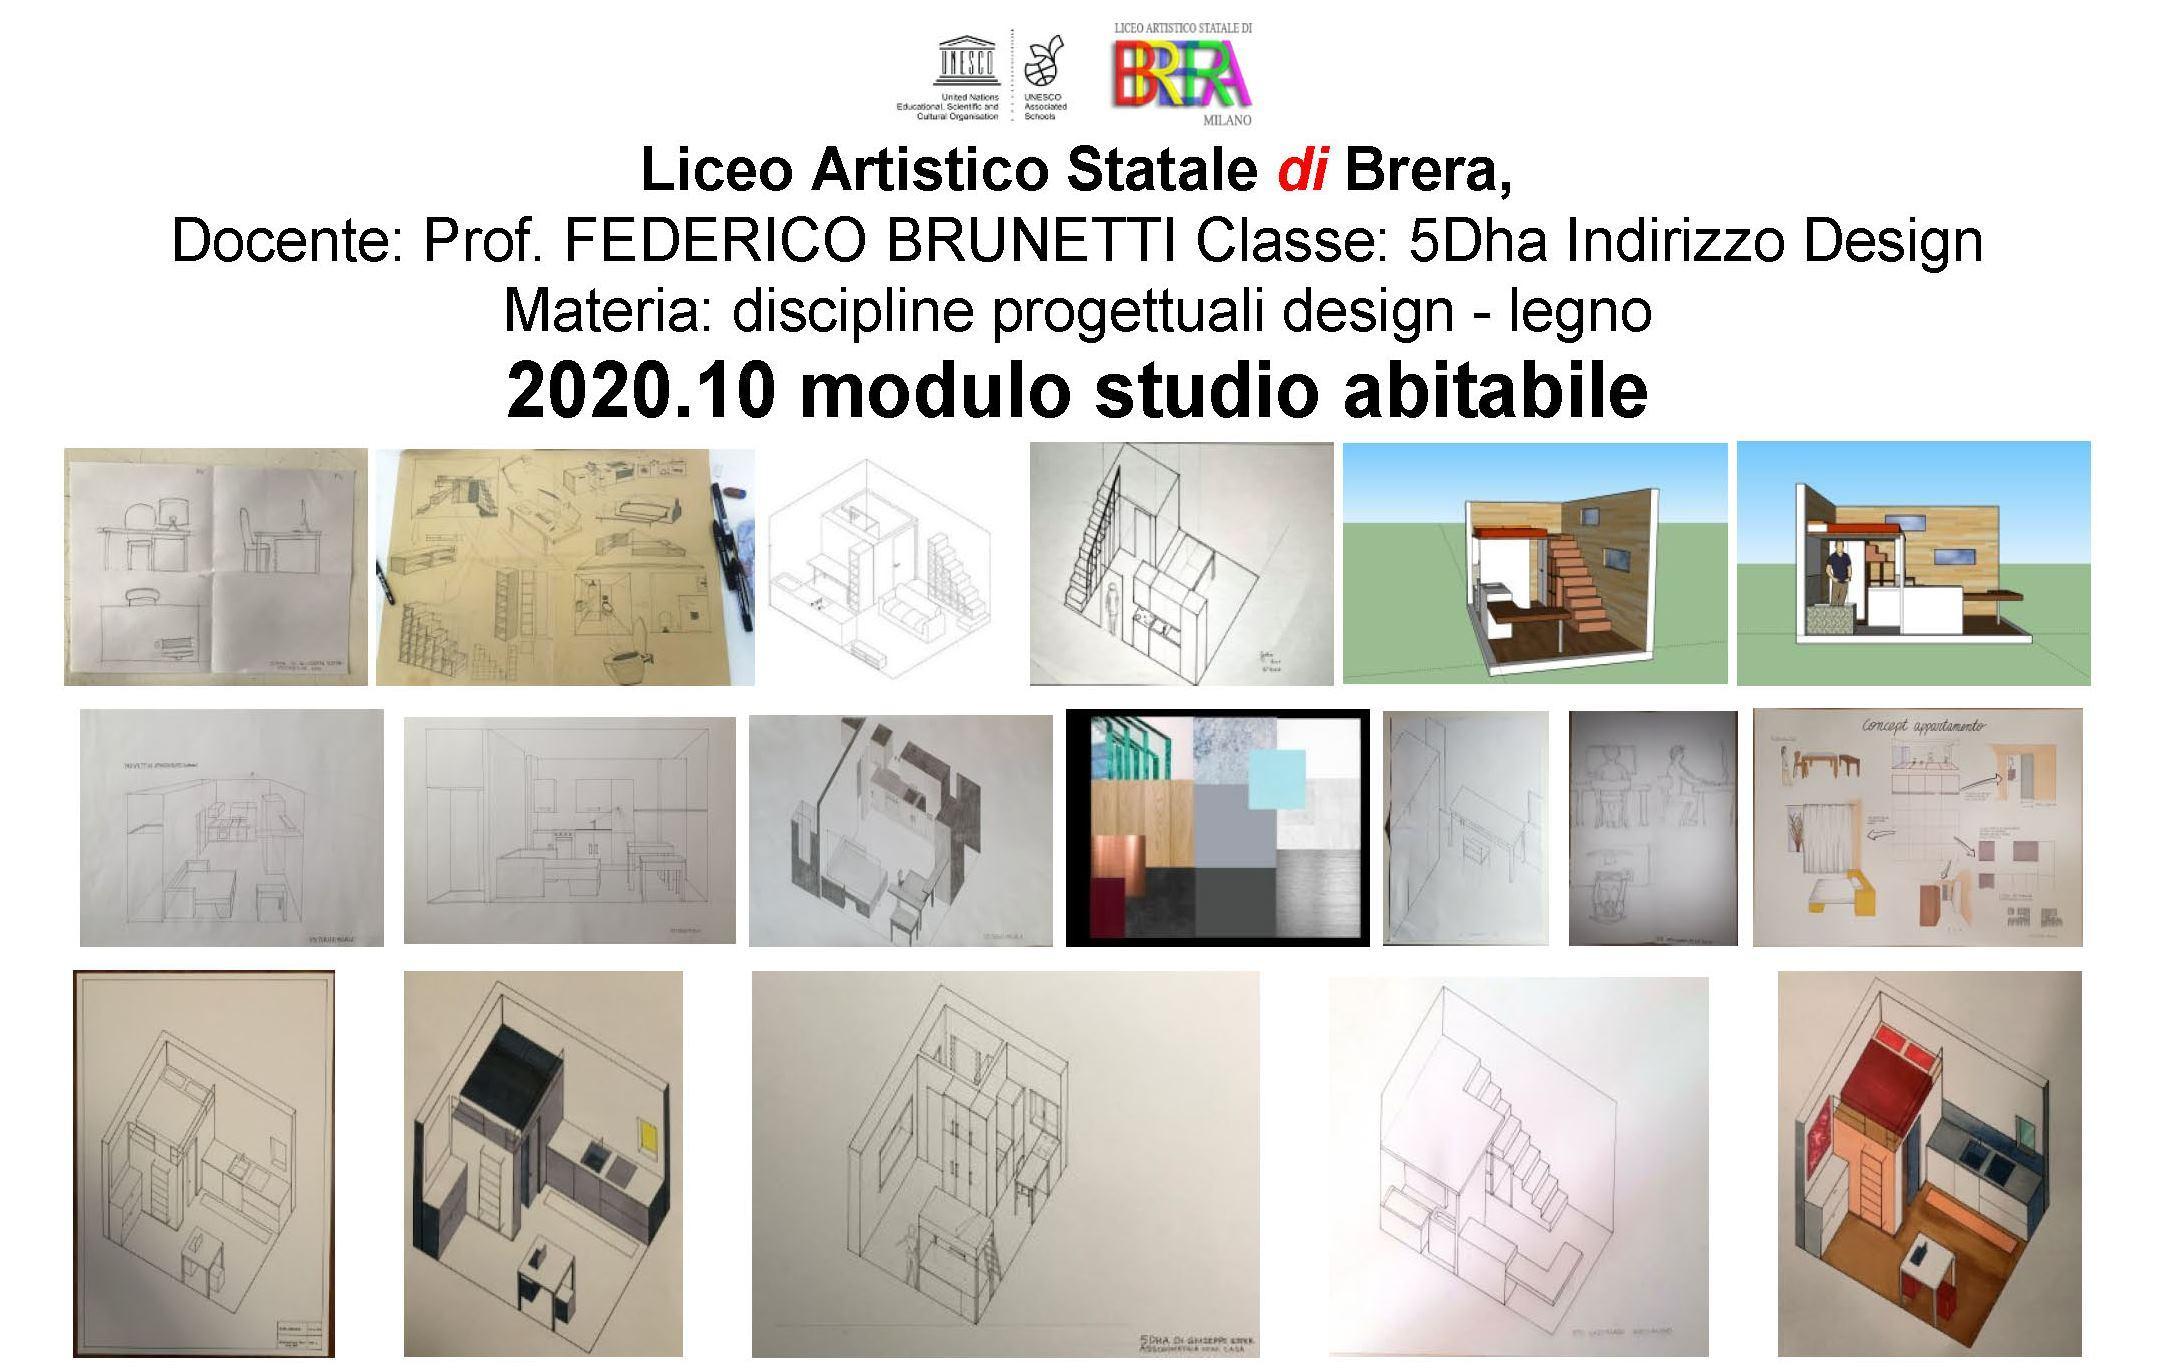 5Dha-Design-Prog.-prof-Federico-Brunetti-2020.10-POSTER-rev-2020.12A